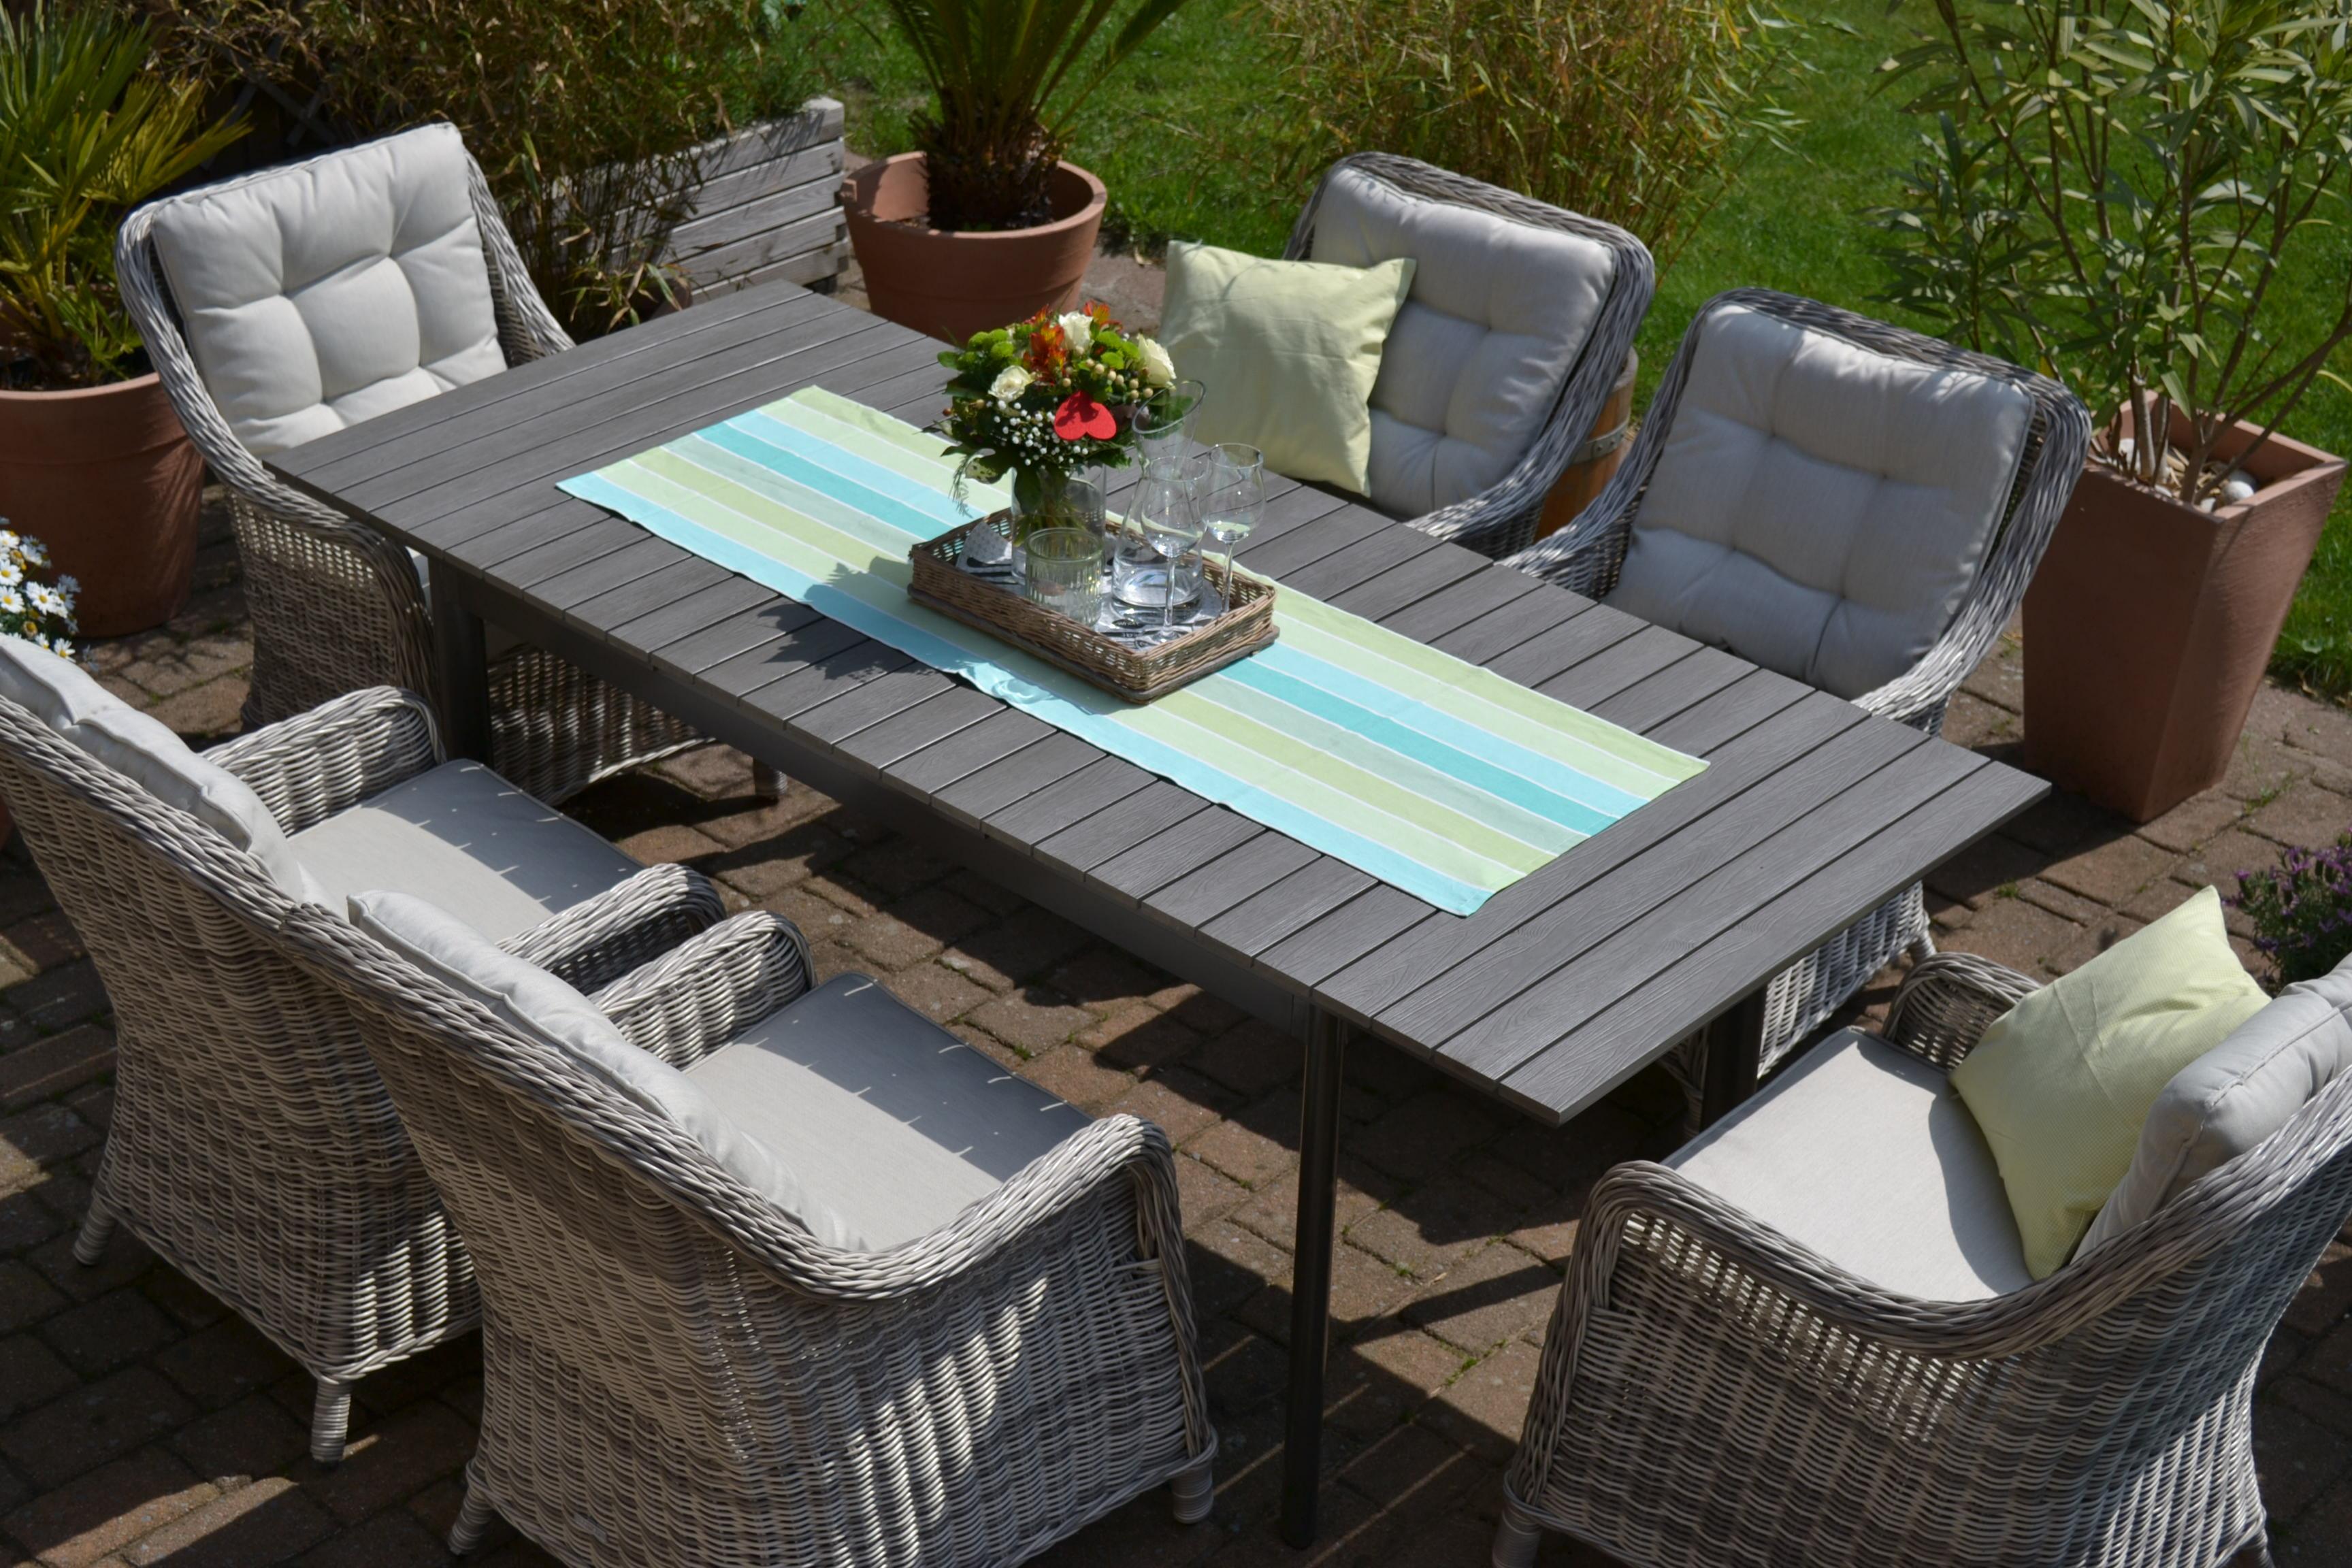 paletten sofa kaufen palettensofa sofa aus paletten. Black Bedroom Furniture Sets. Home Design Ideas